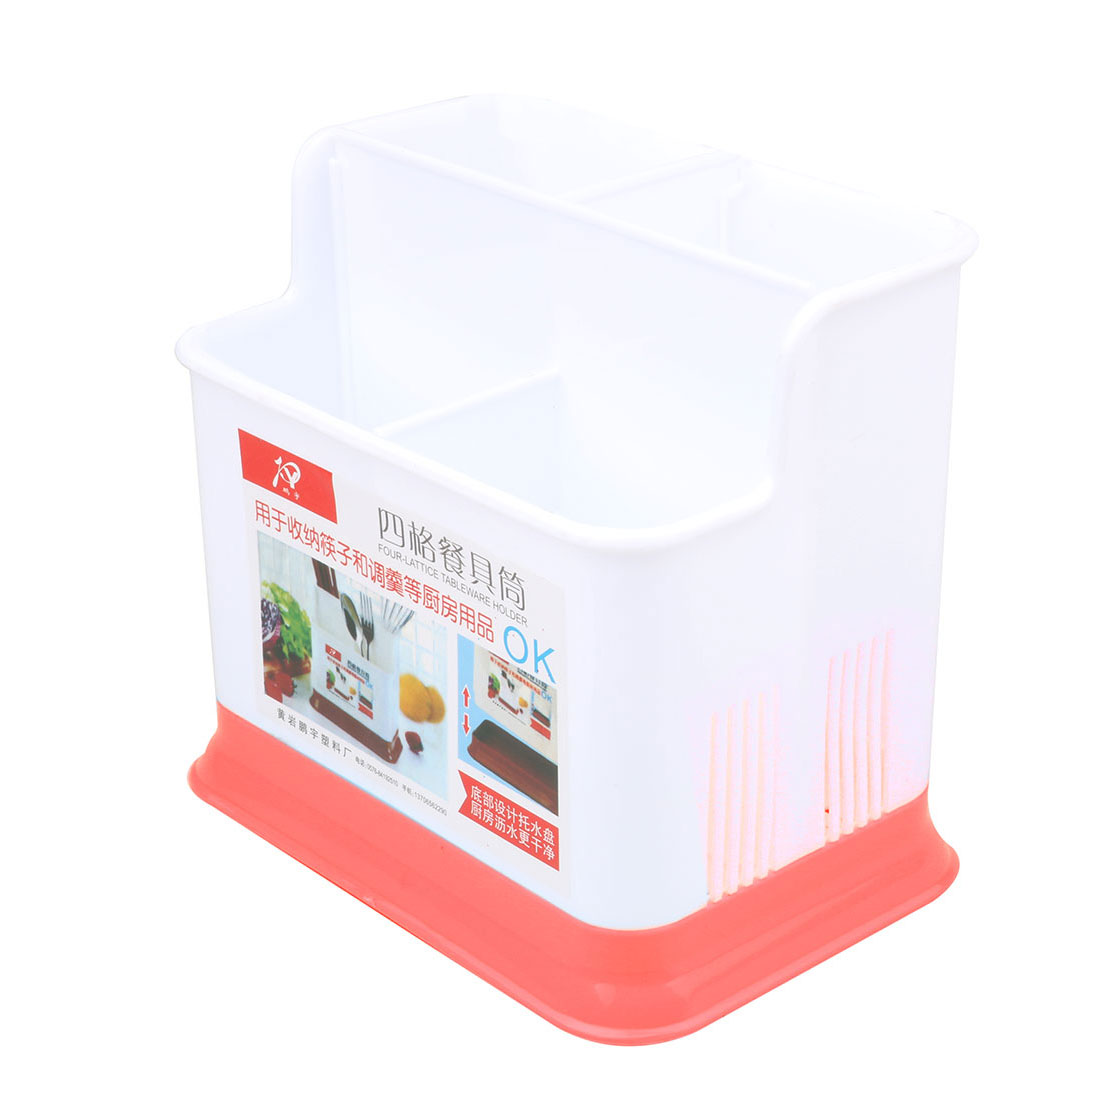 Kitchen Home Plastic Rectangle Design 4 Compartments Chopsticks Organizer Holder Case Pink